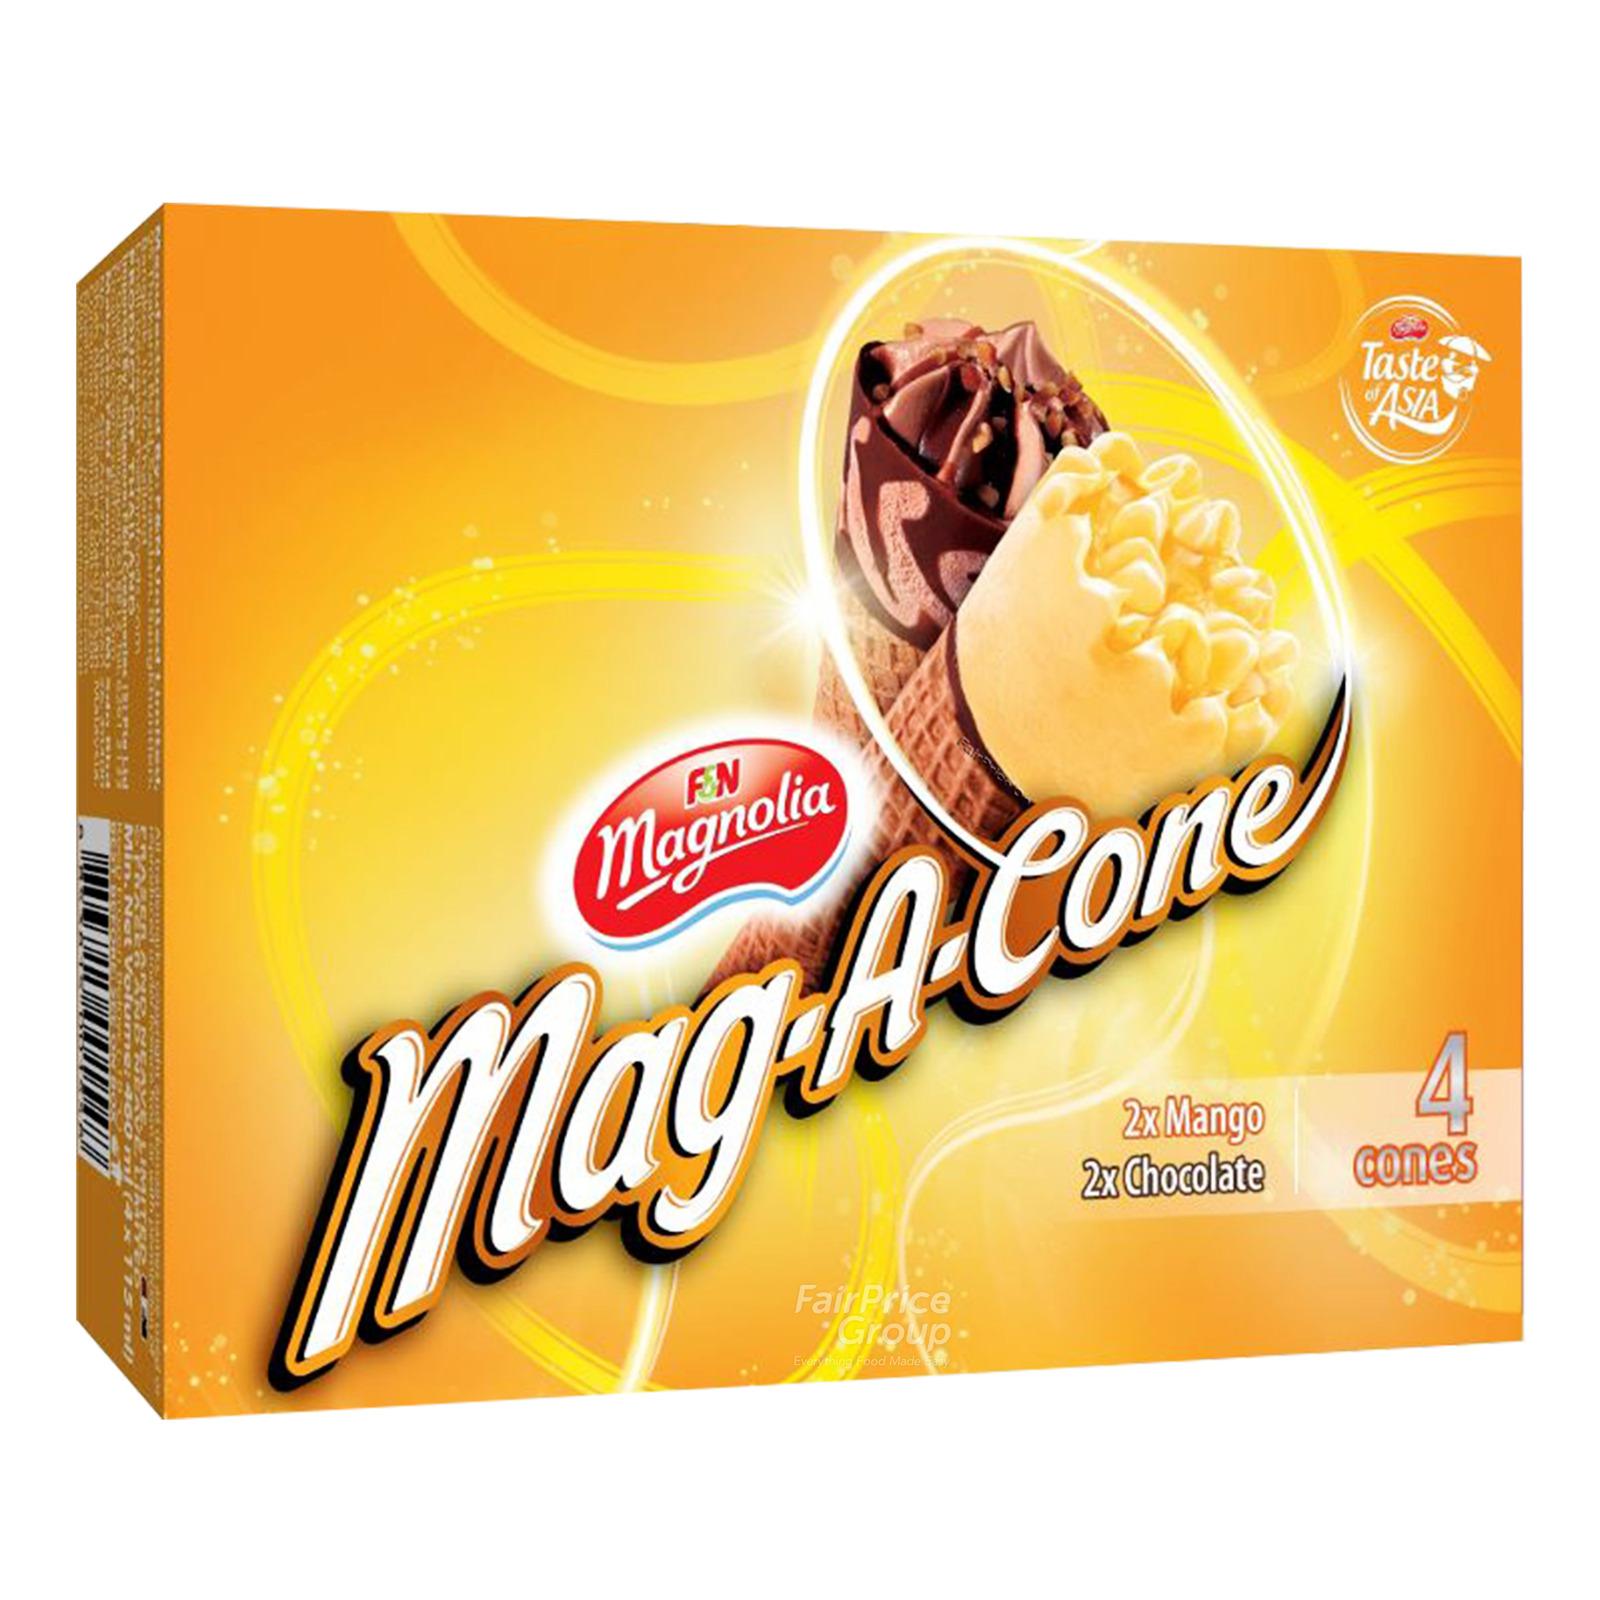 F&N Magnolia Mag-A-Cone Ice Cream - Mango & Chocolate